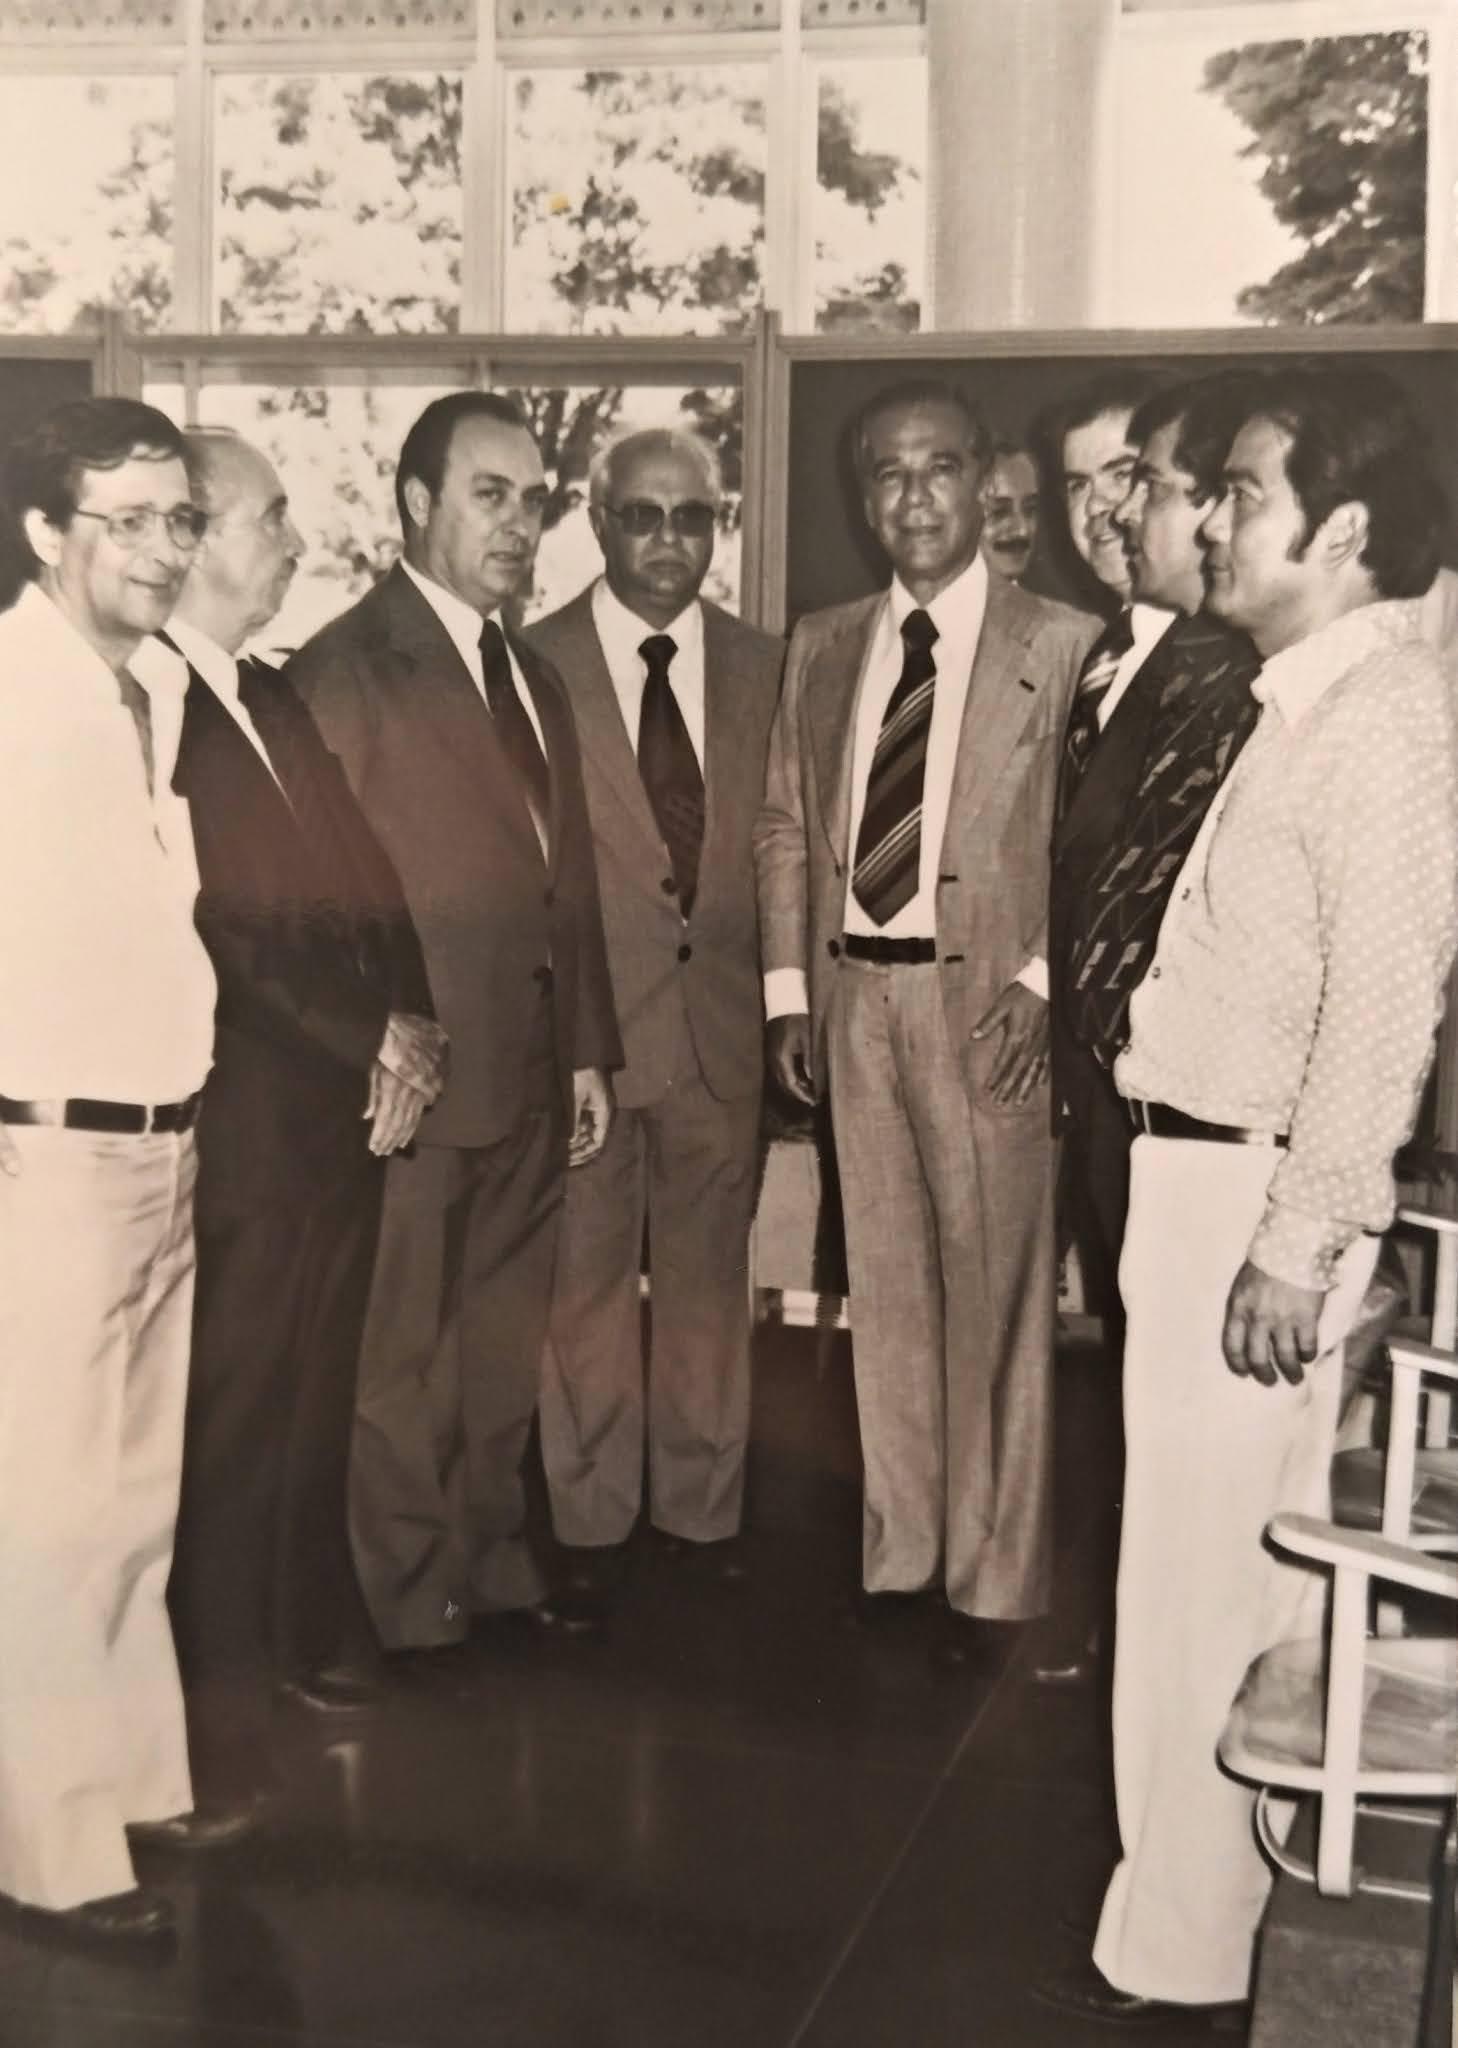 Autoridades no aeroporto - Anos 1970